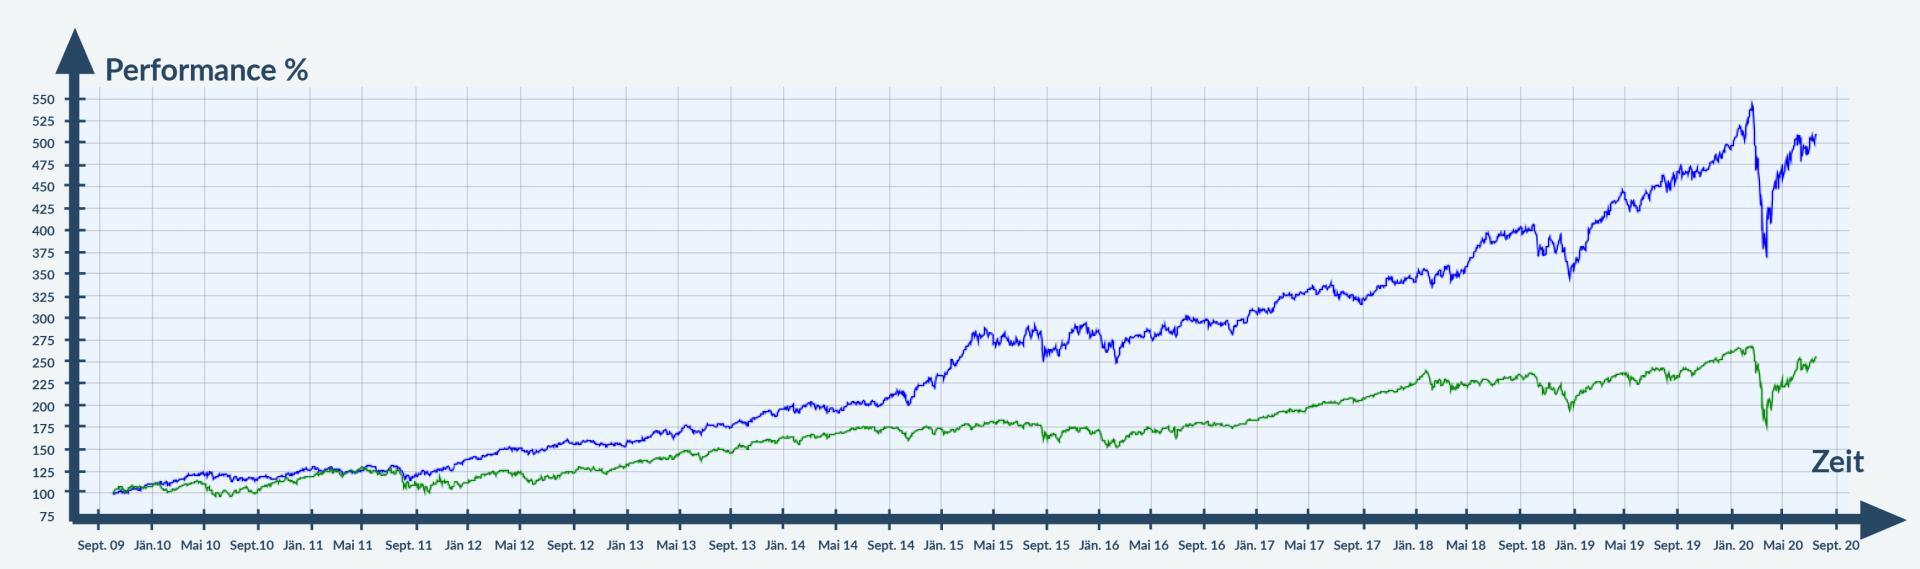 Chart - MSCI vs. Seilern World